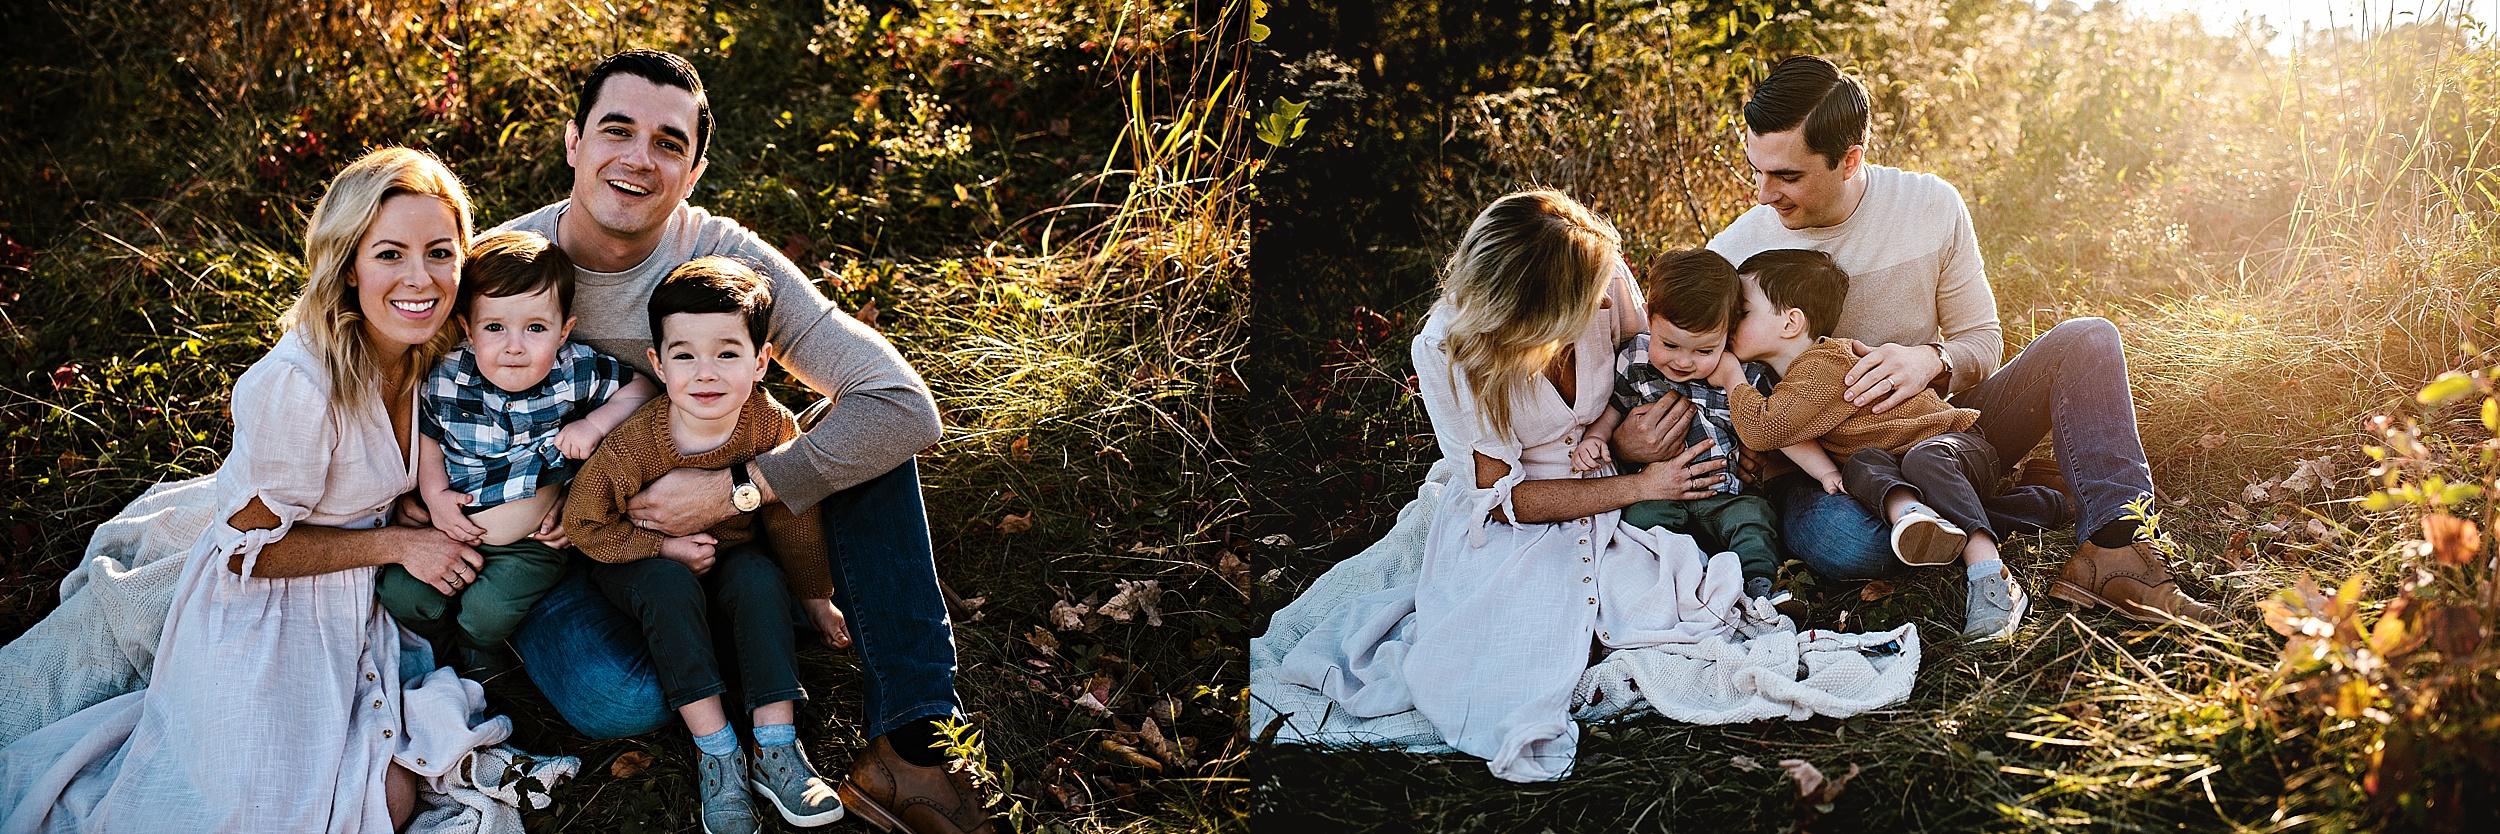 lauren-grayson-photography-portrait-artist-akron-cleveland-ohio-photographer-family-session-fields-sunset-fall_0175.jpg